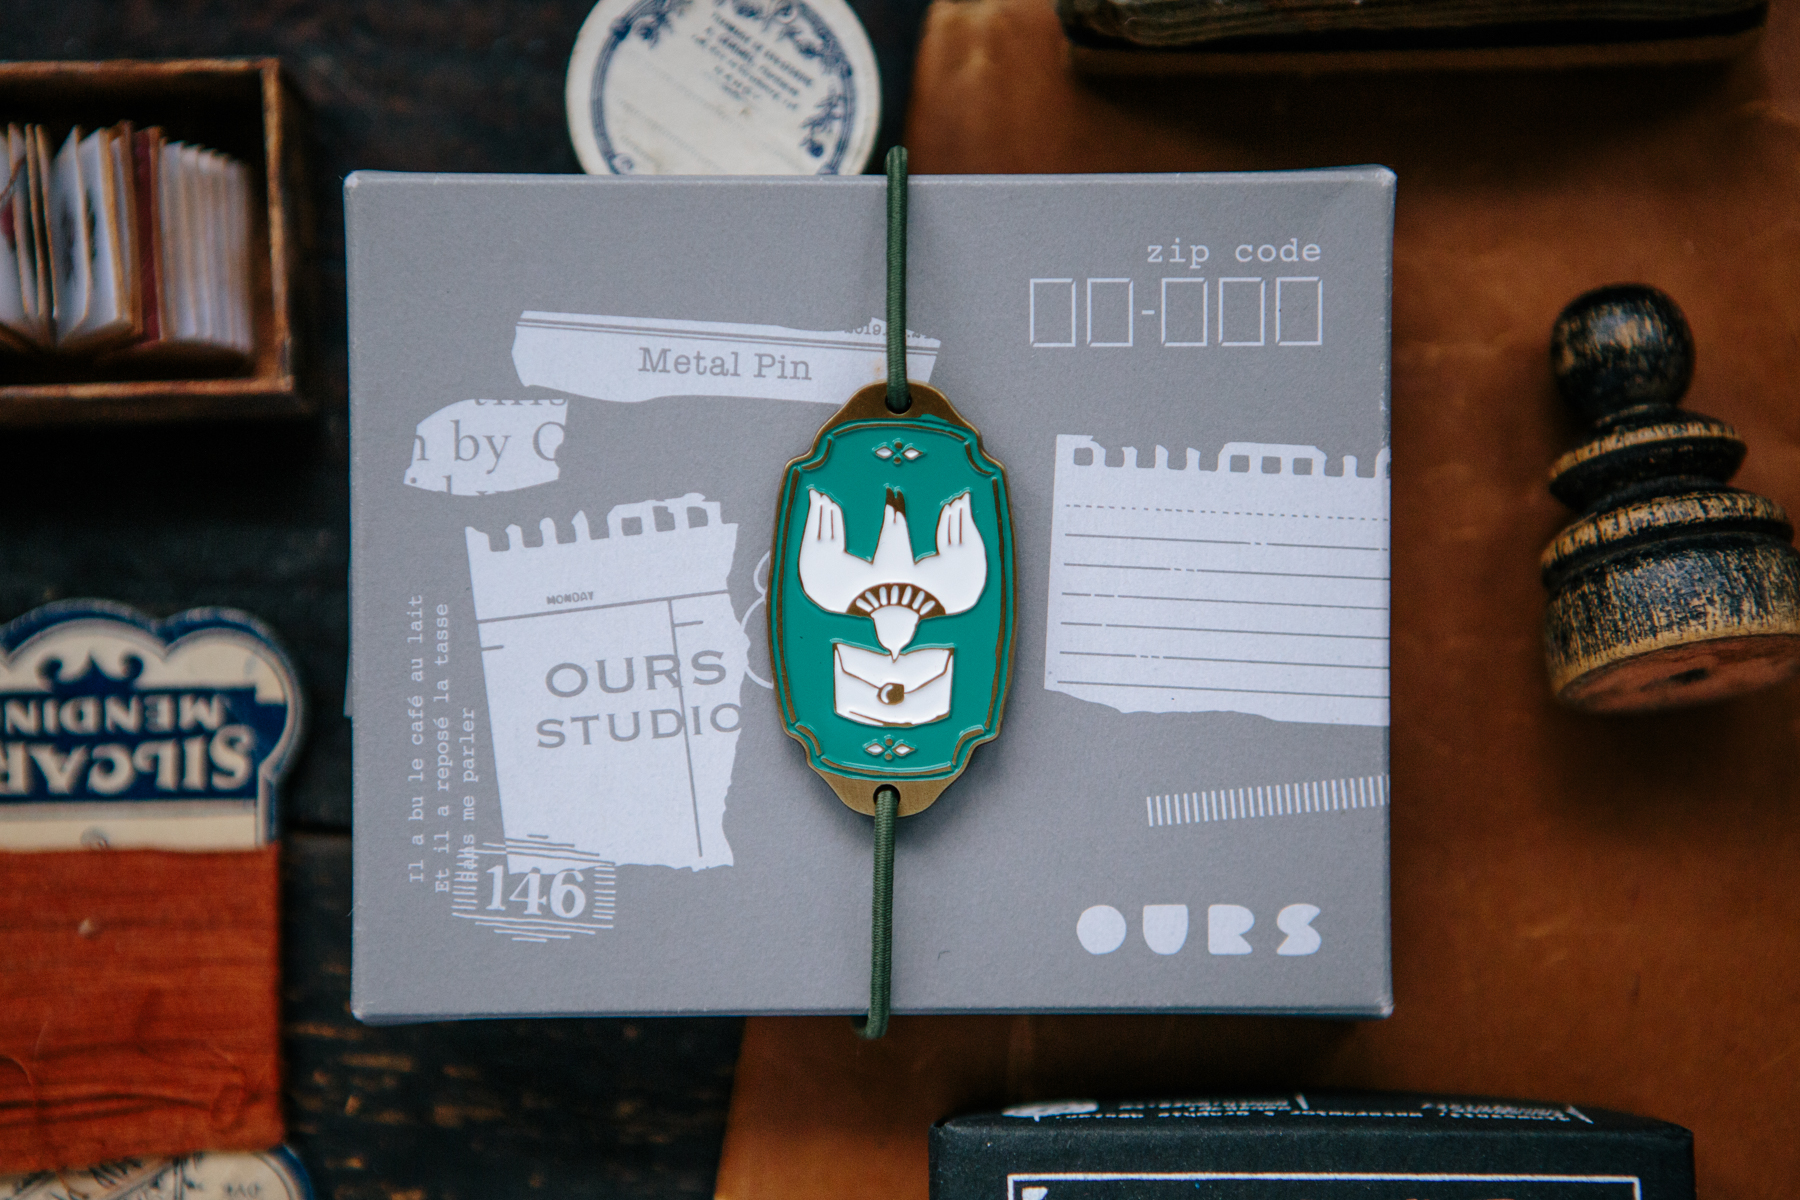 OURS 抽屜之中 綠色信使鳥 金屬 書綁 飾物